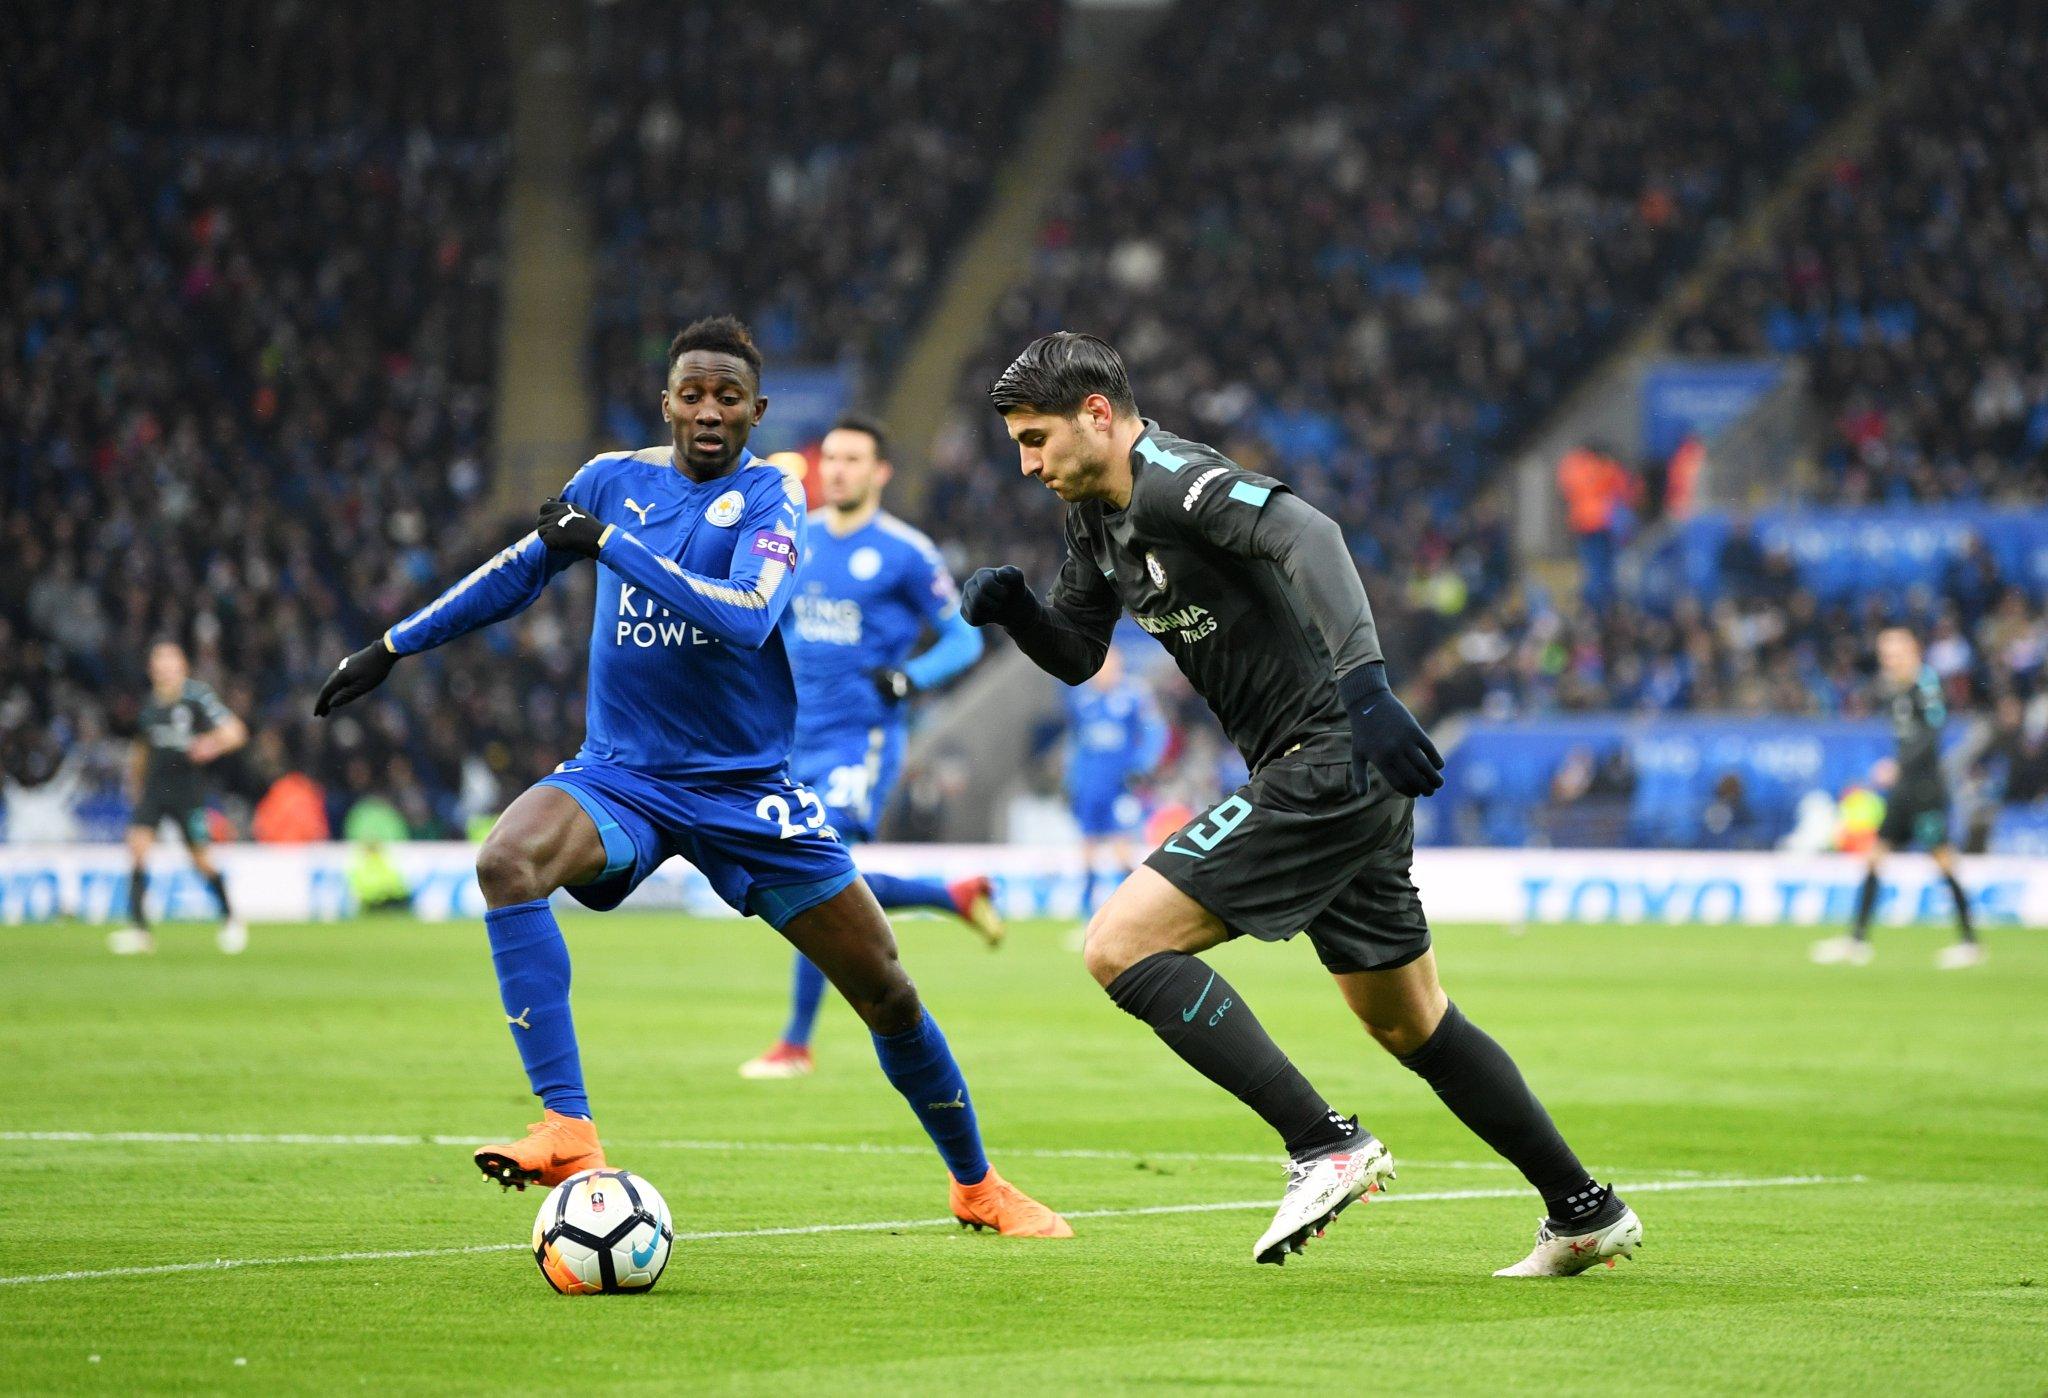 Oliseh describes Liverpool target Ndidi as 'World Class'